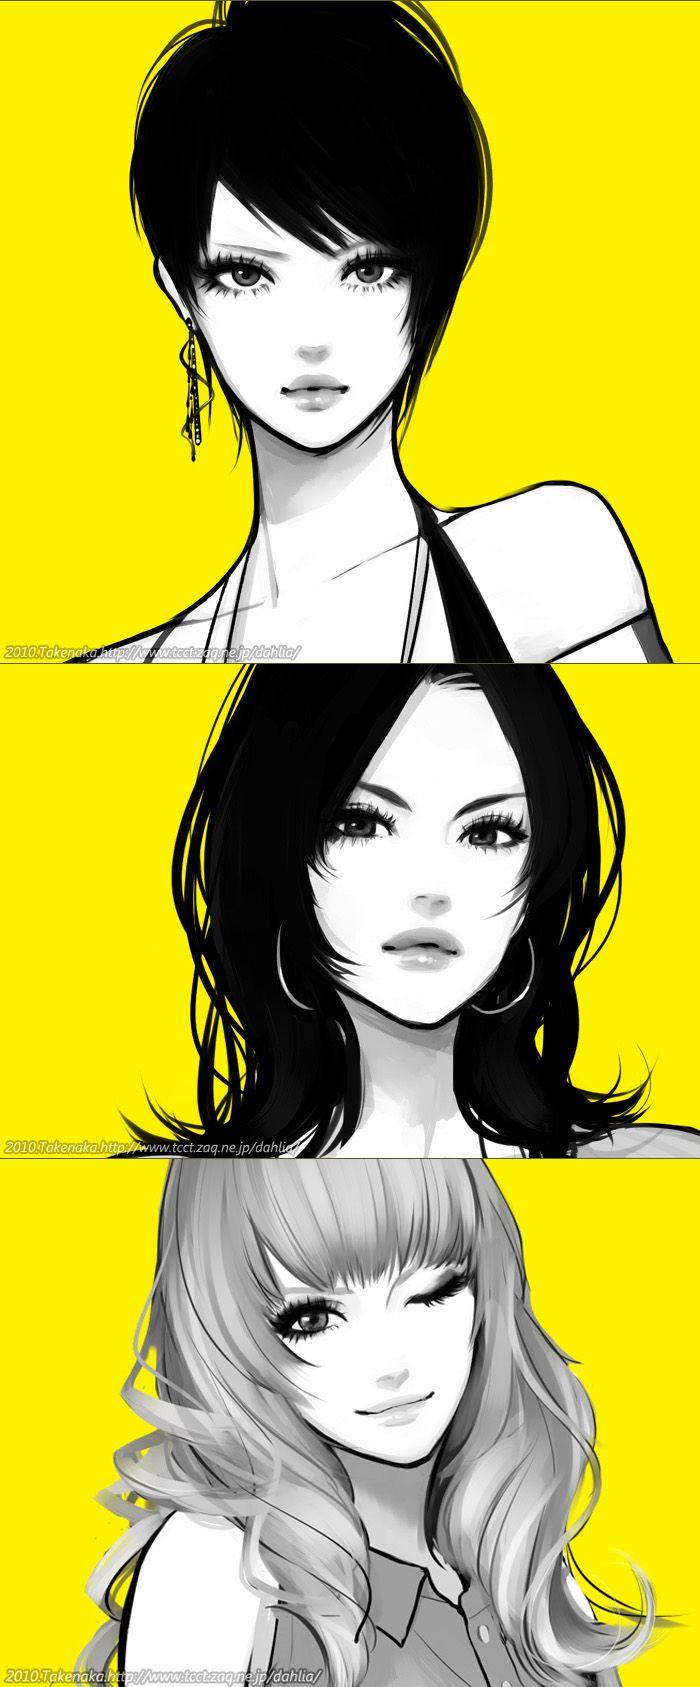 Girls illustration, drawing / Ragazze, illustrazione, disegno - by Dahlia Takenaka